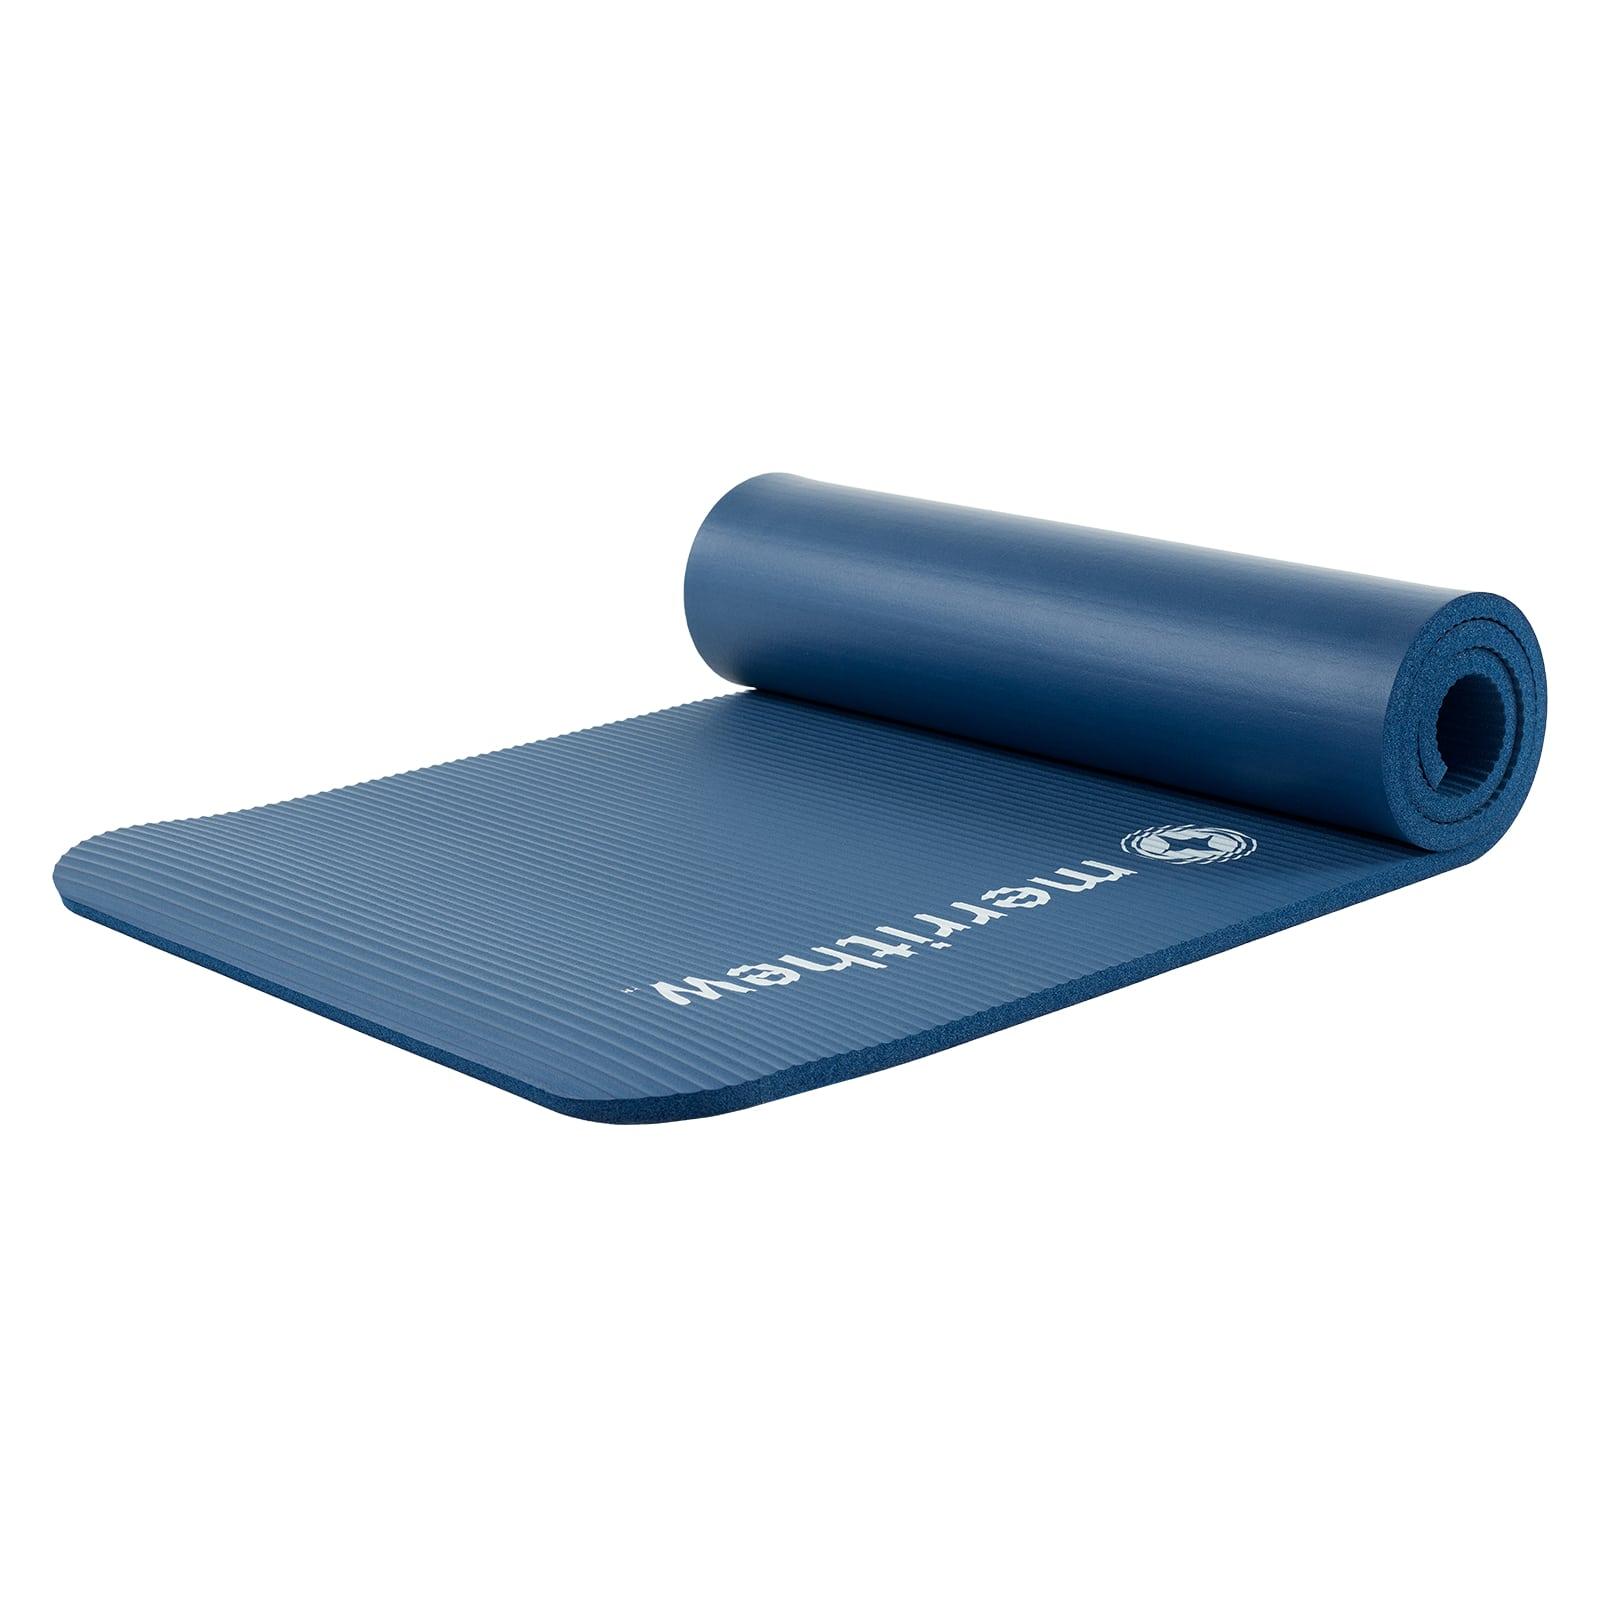 Deluxe Pilates Mat (midnight Blue)